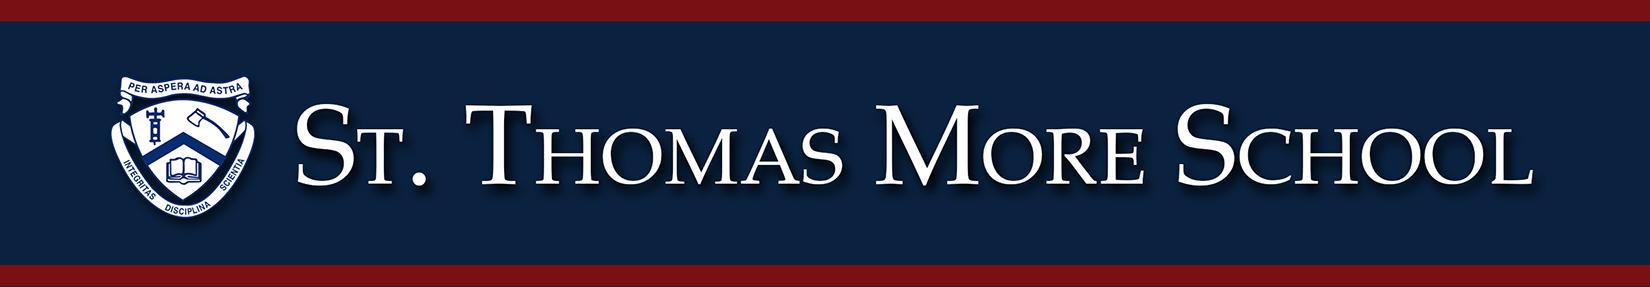 St. Thomas-More School